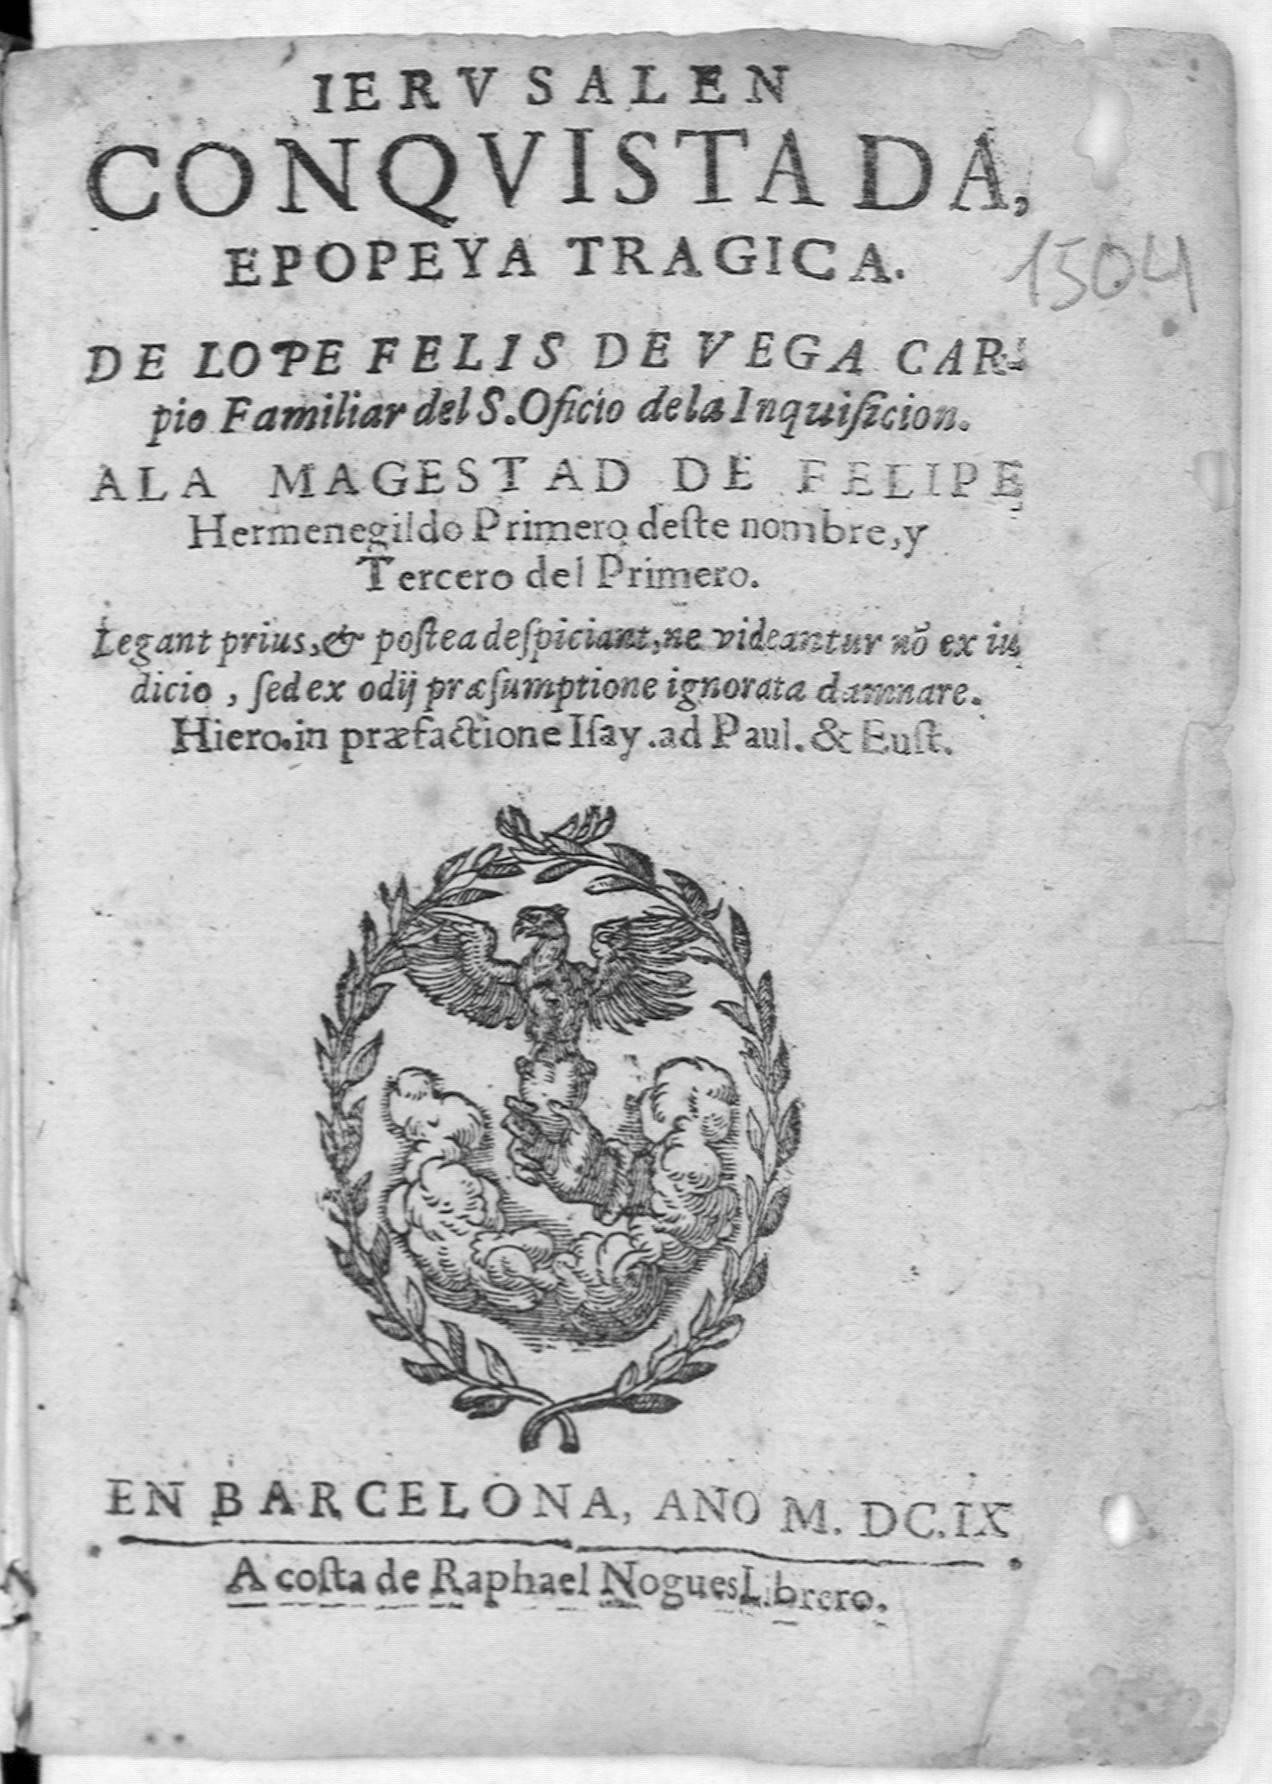 Ierusalen conquistada : epopeya tragica, 1609